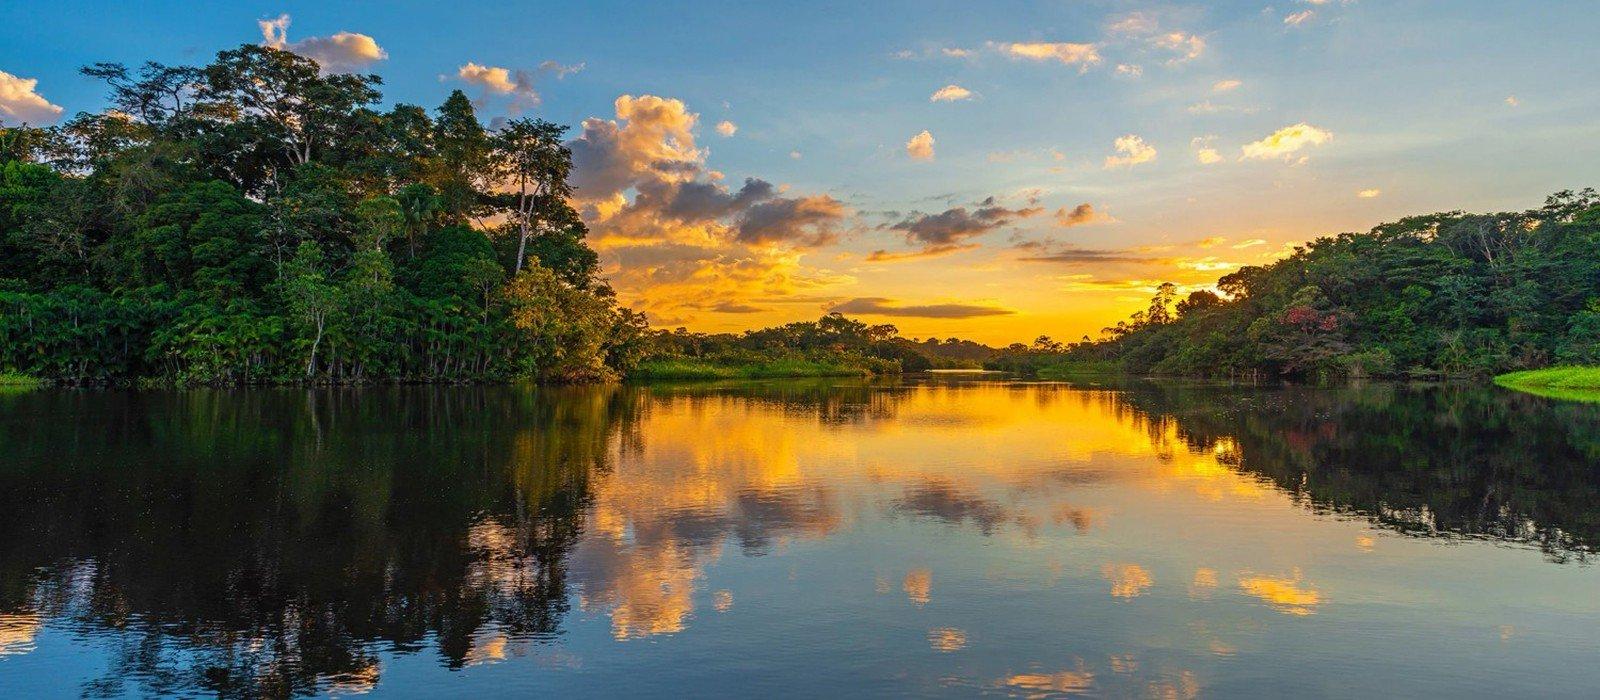 Delfin II Amazon River Cruise